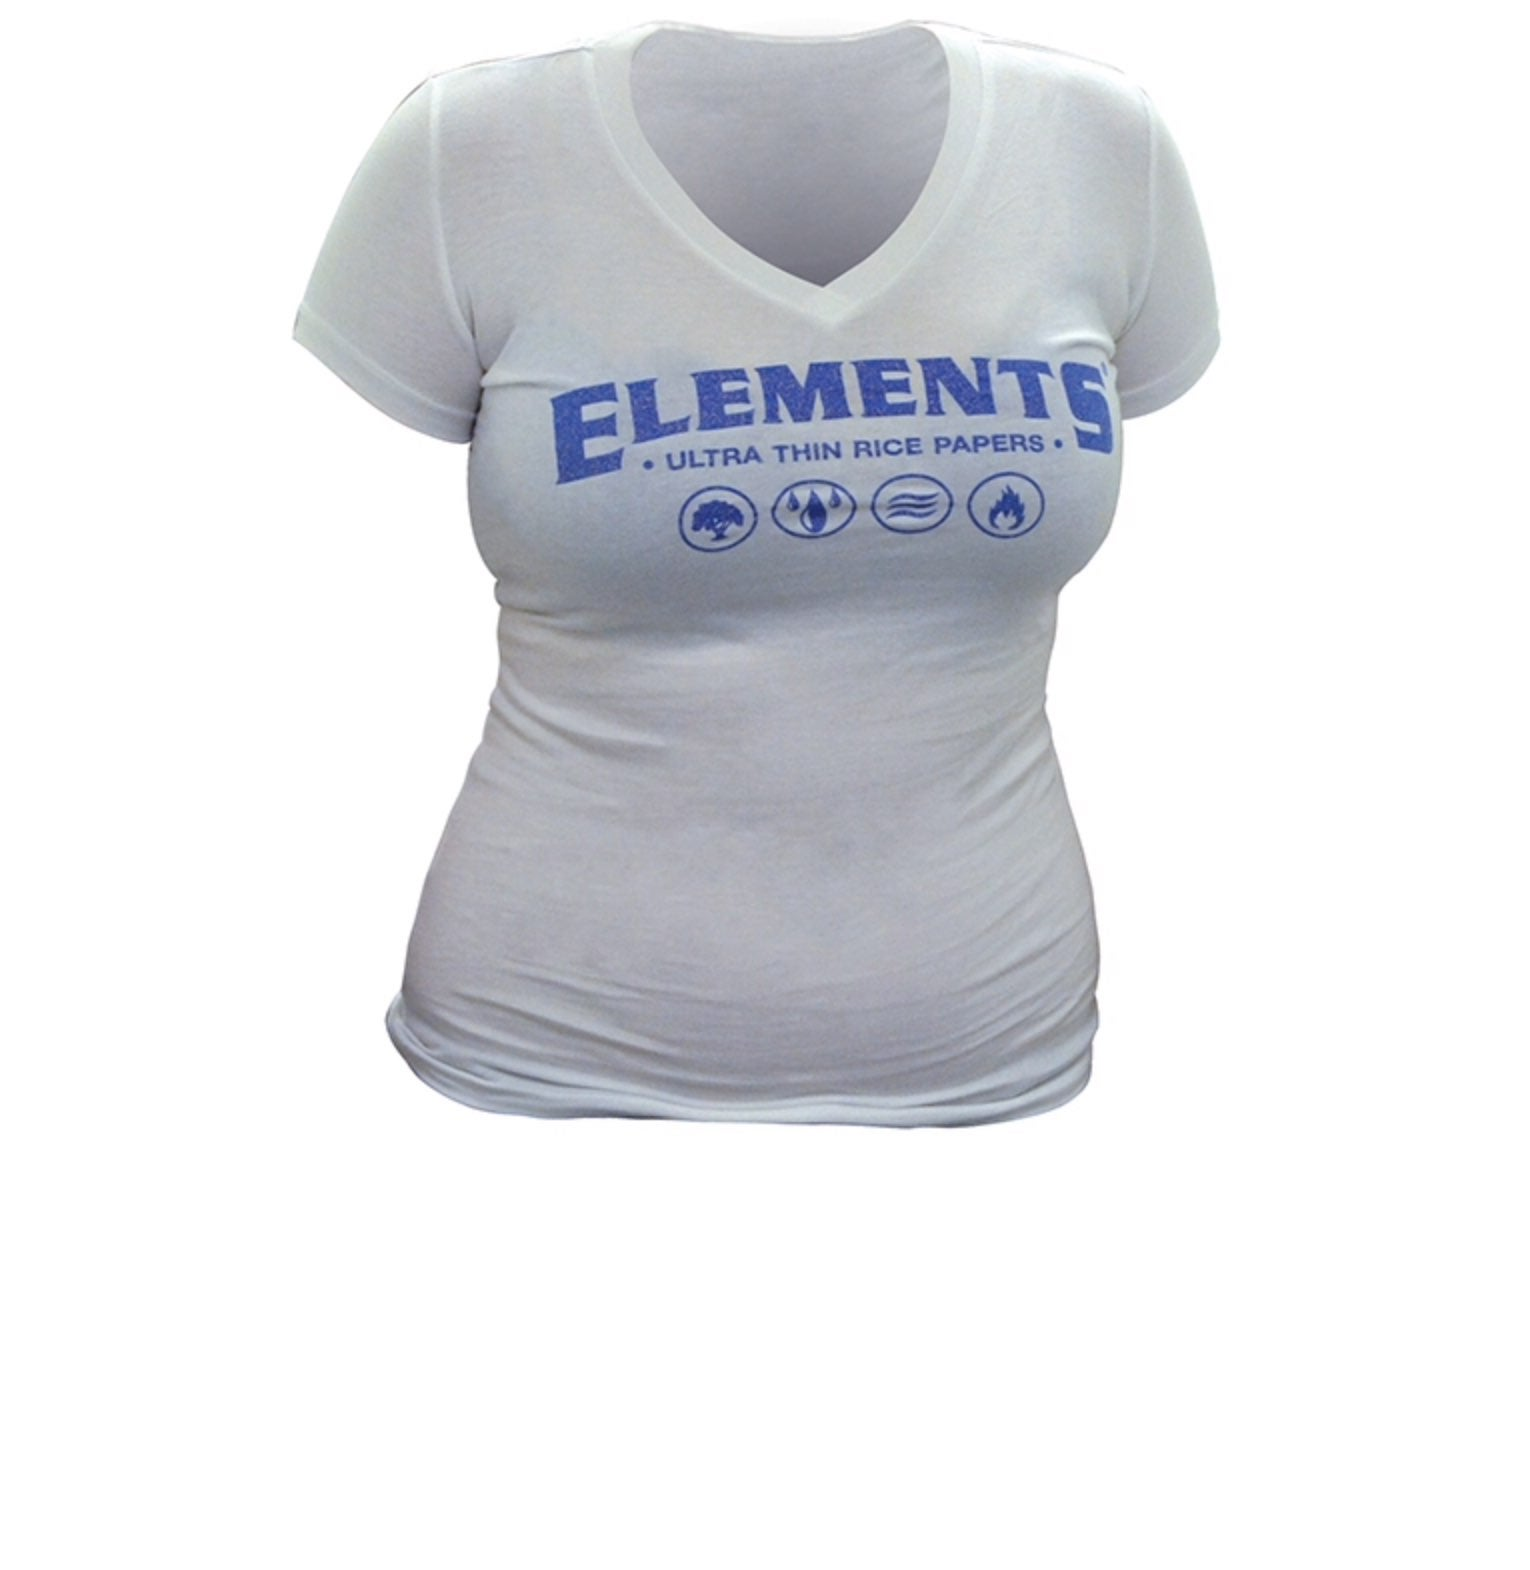 New Elements Ladies White Promo Shirt-M